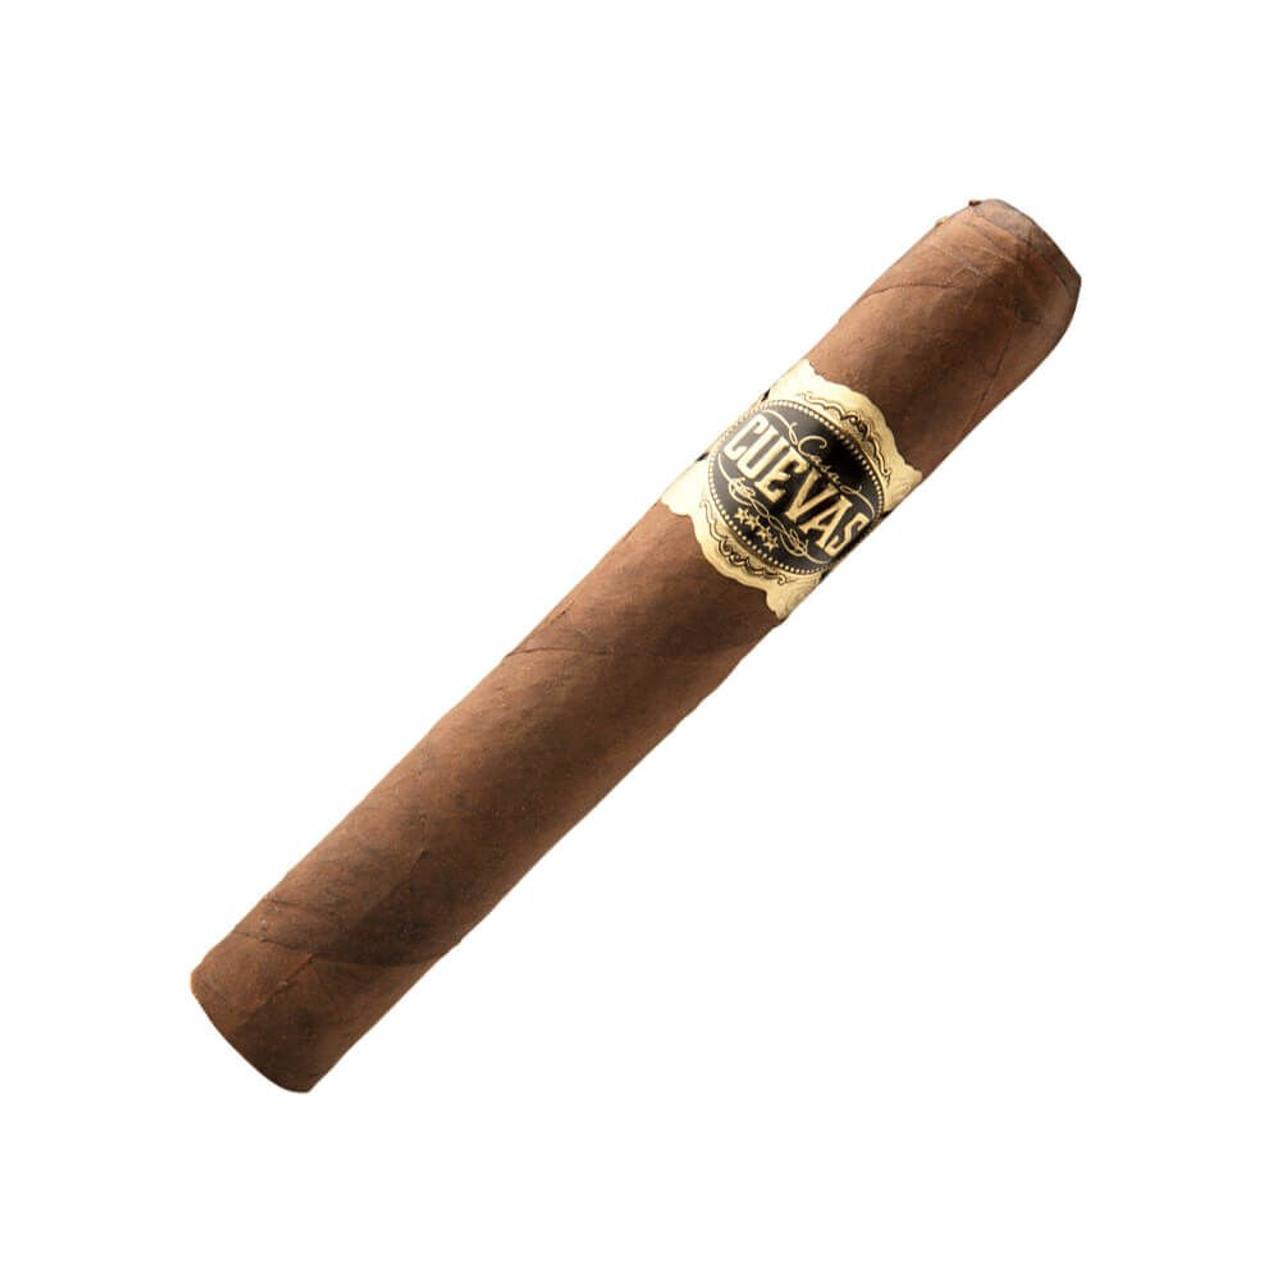 Casa Cuevas Maduro Robusto Cigars - 5 x 52 (Box of 20)